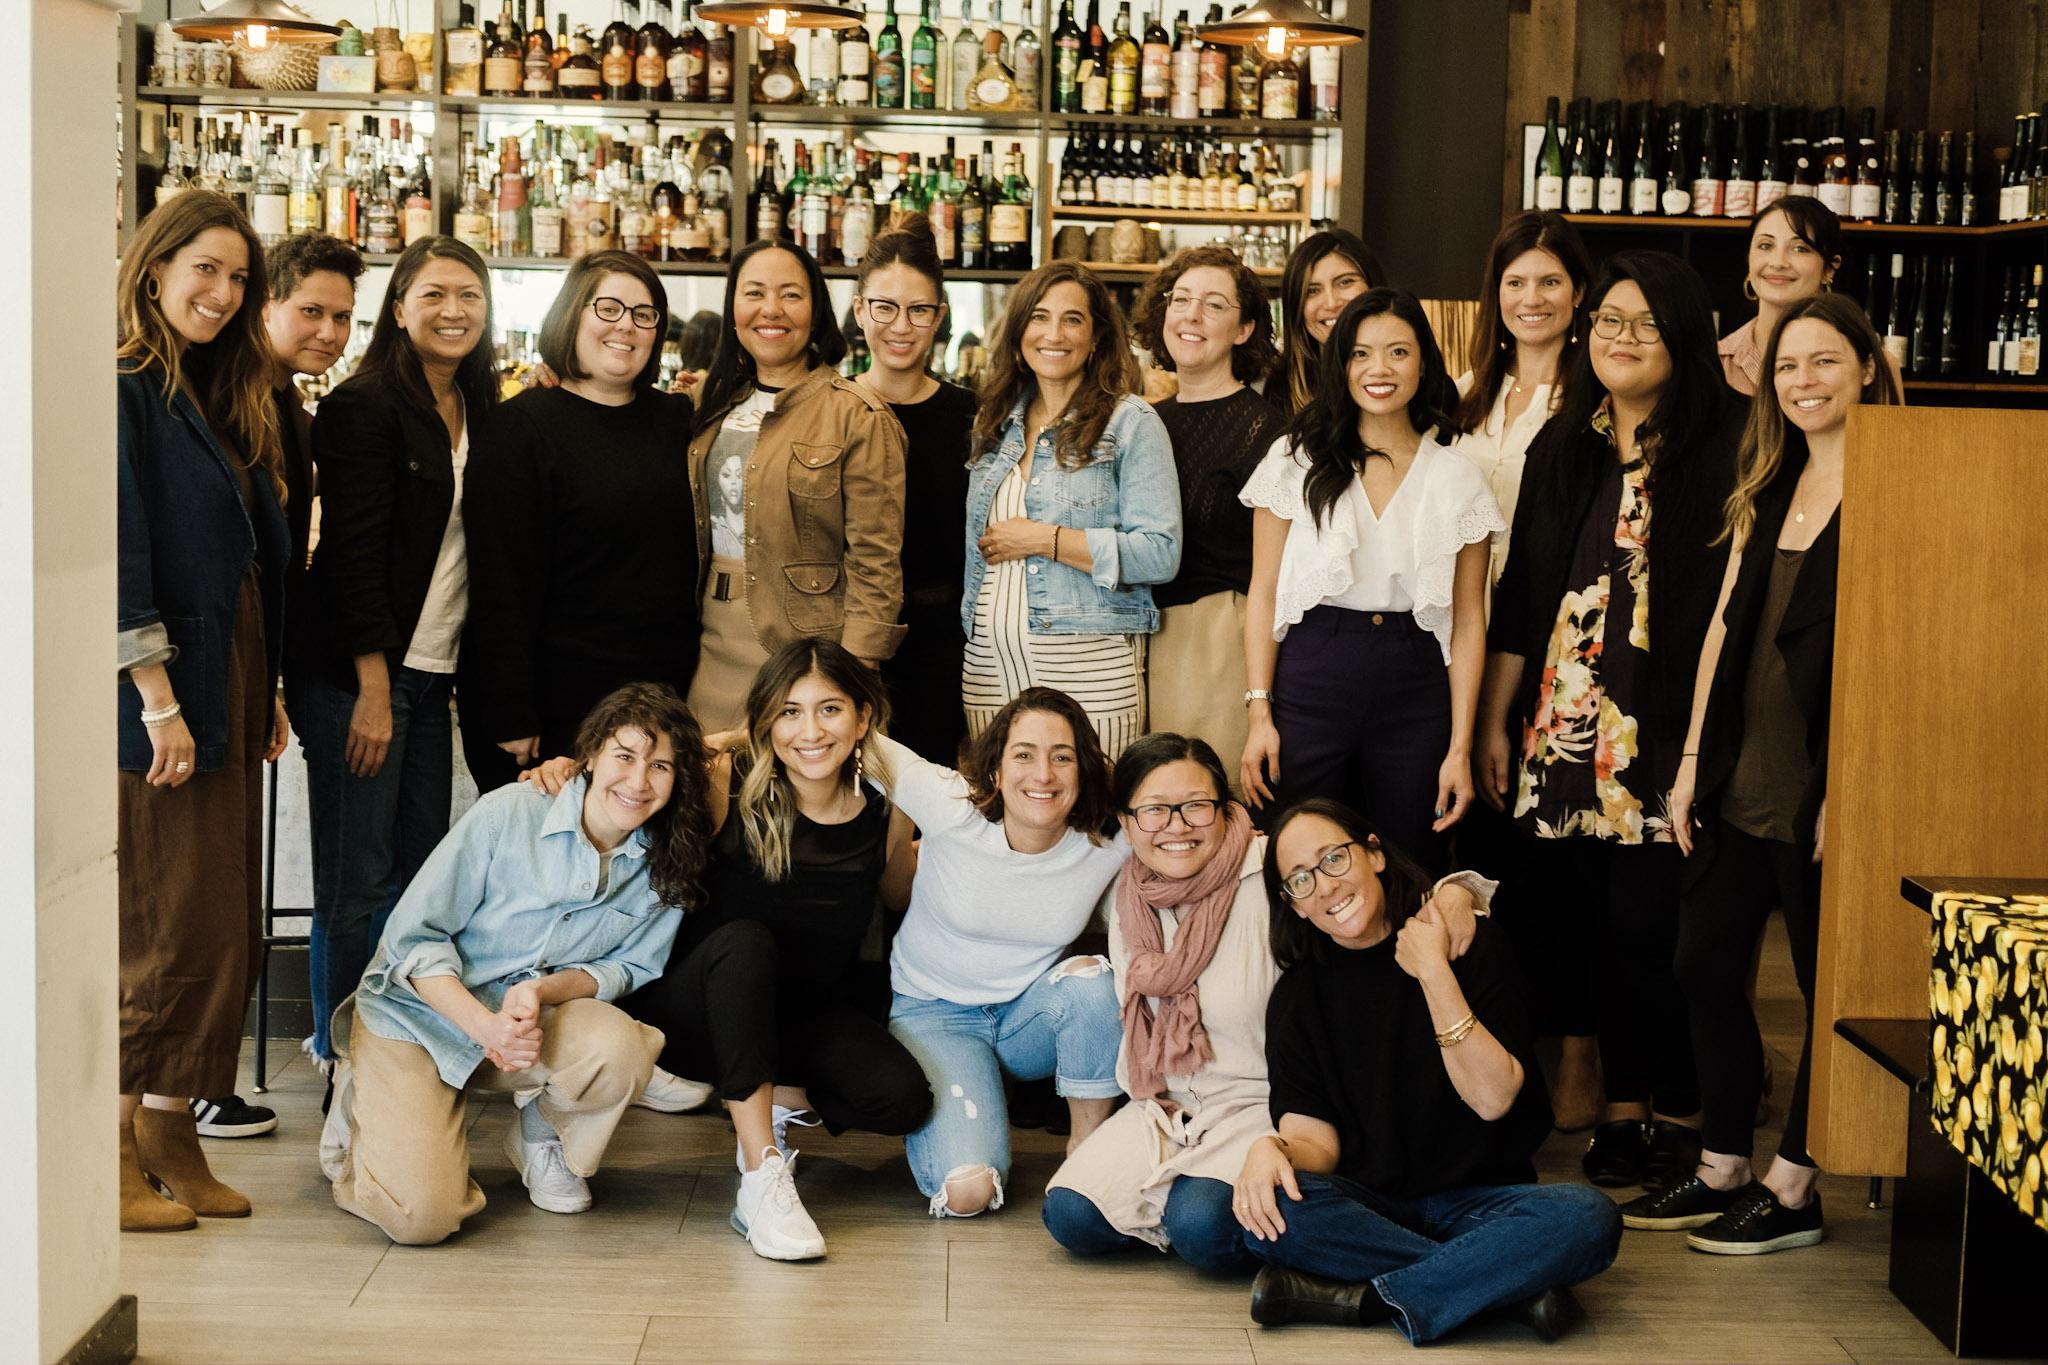 LA's Top Female Restaurateurs Celebrate International Women's Day at HLAY